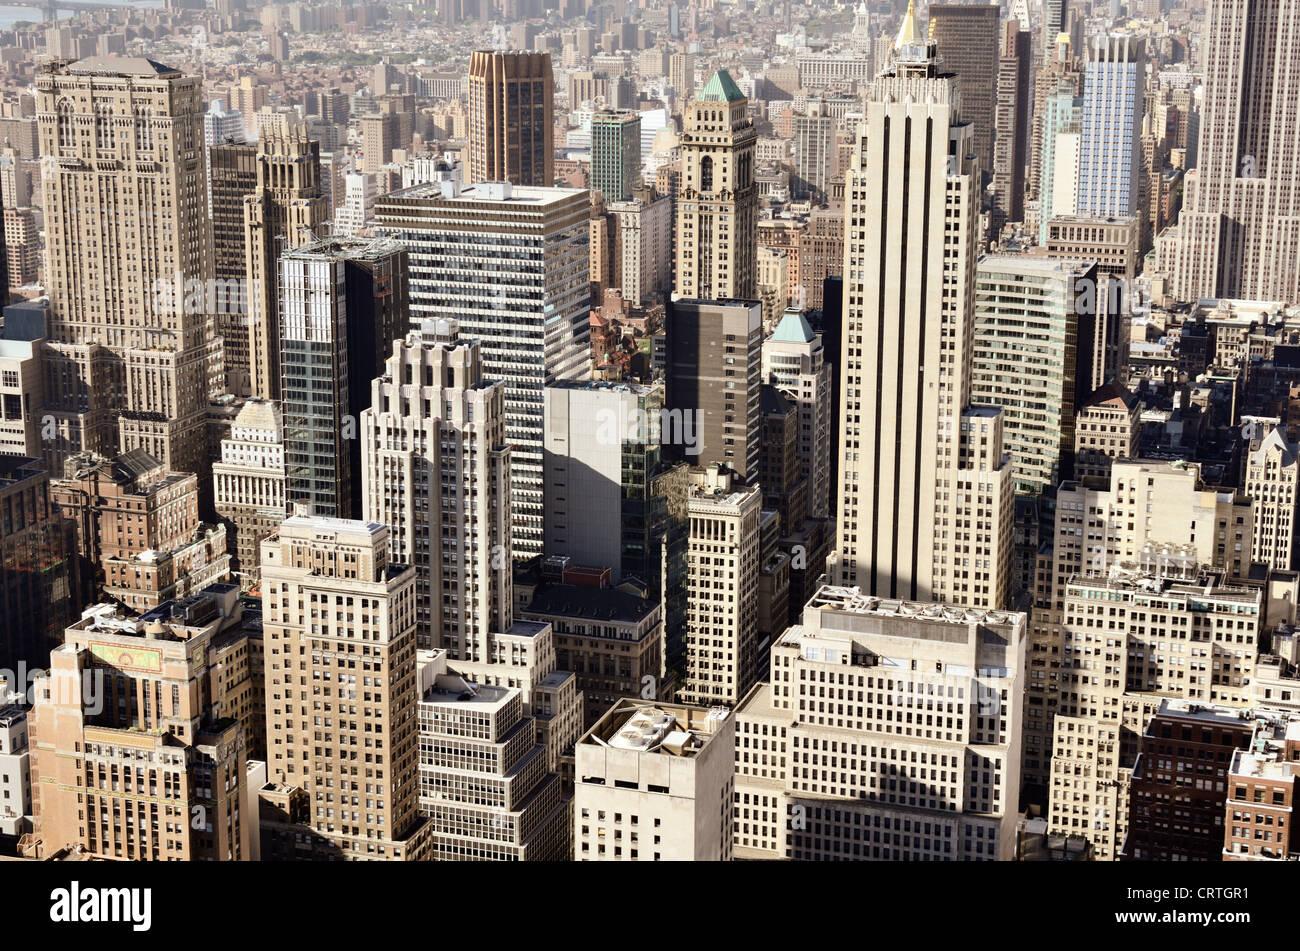 Skyline of downtown New York, New York, USA - Stock Image